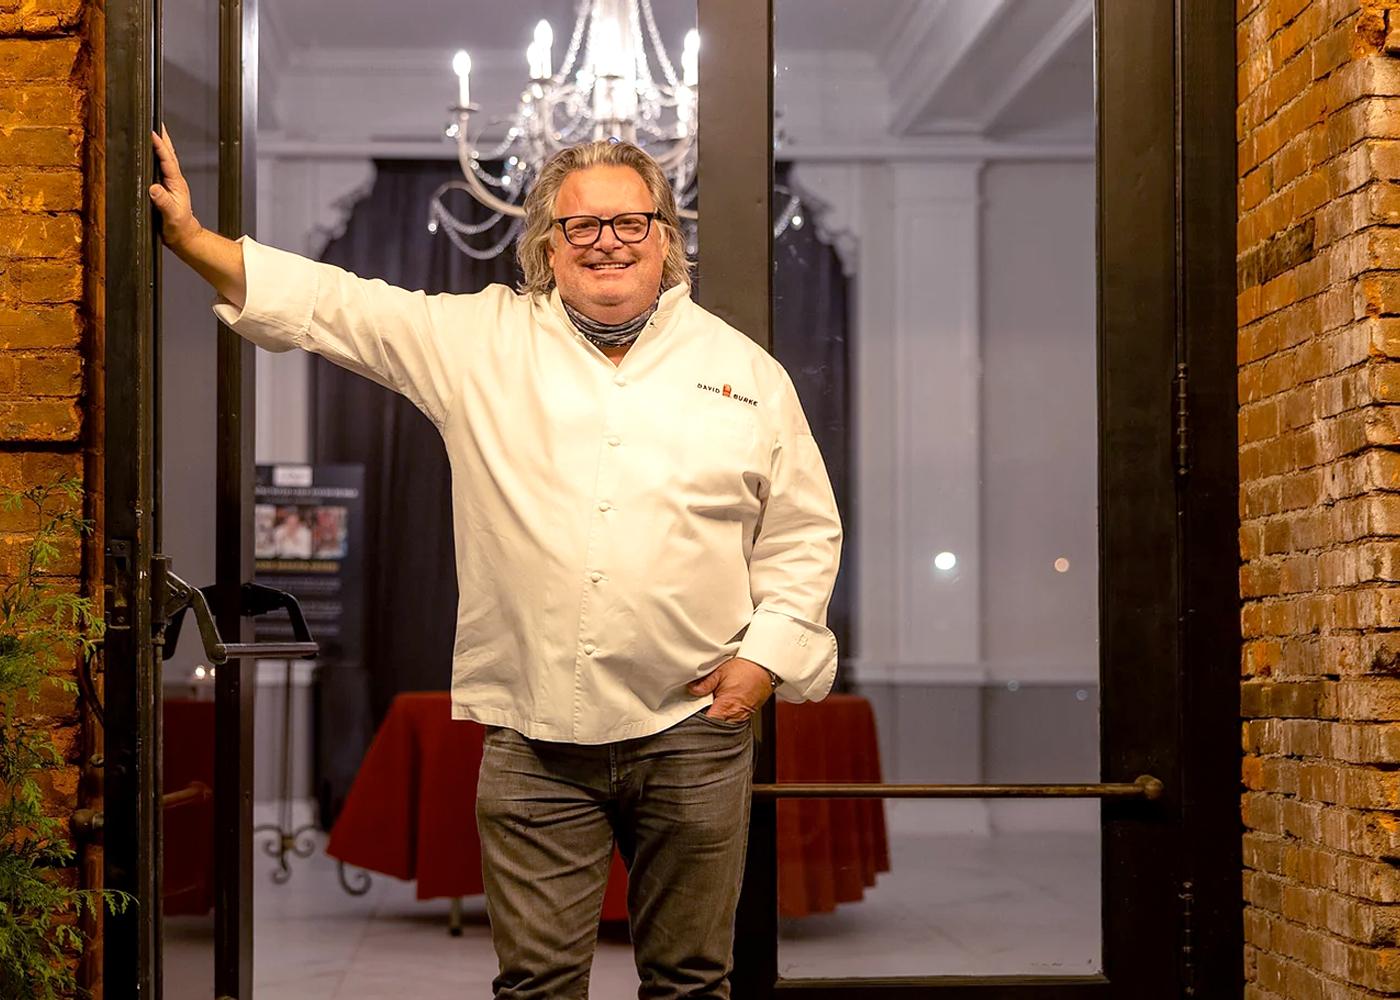 Chef at Revel 32